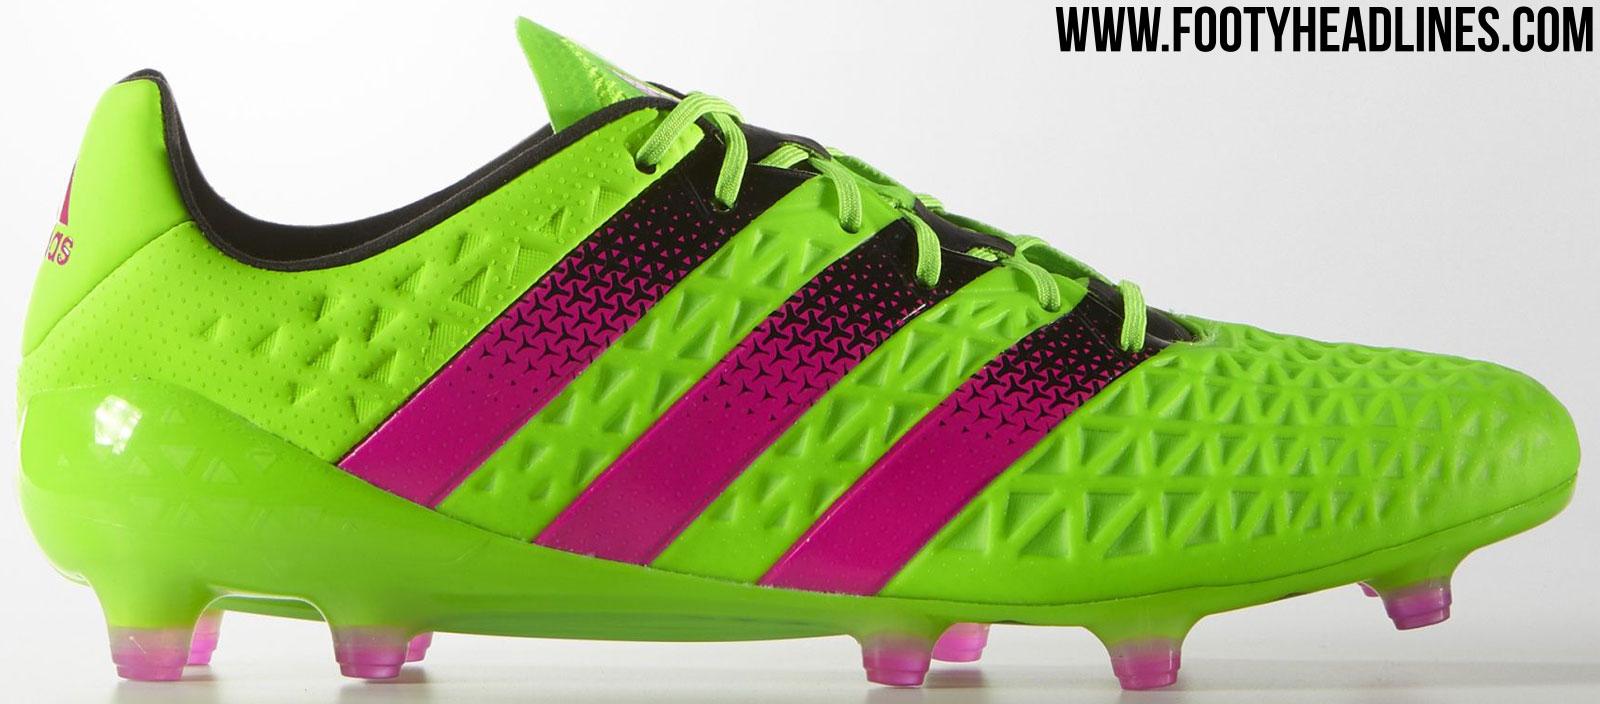 Adidas Ace 16